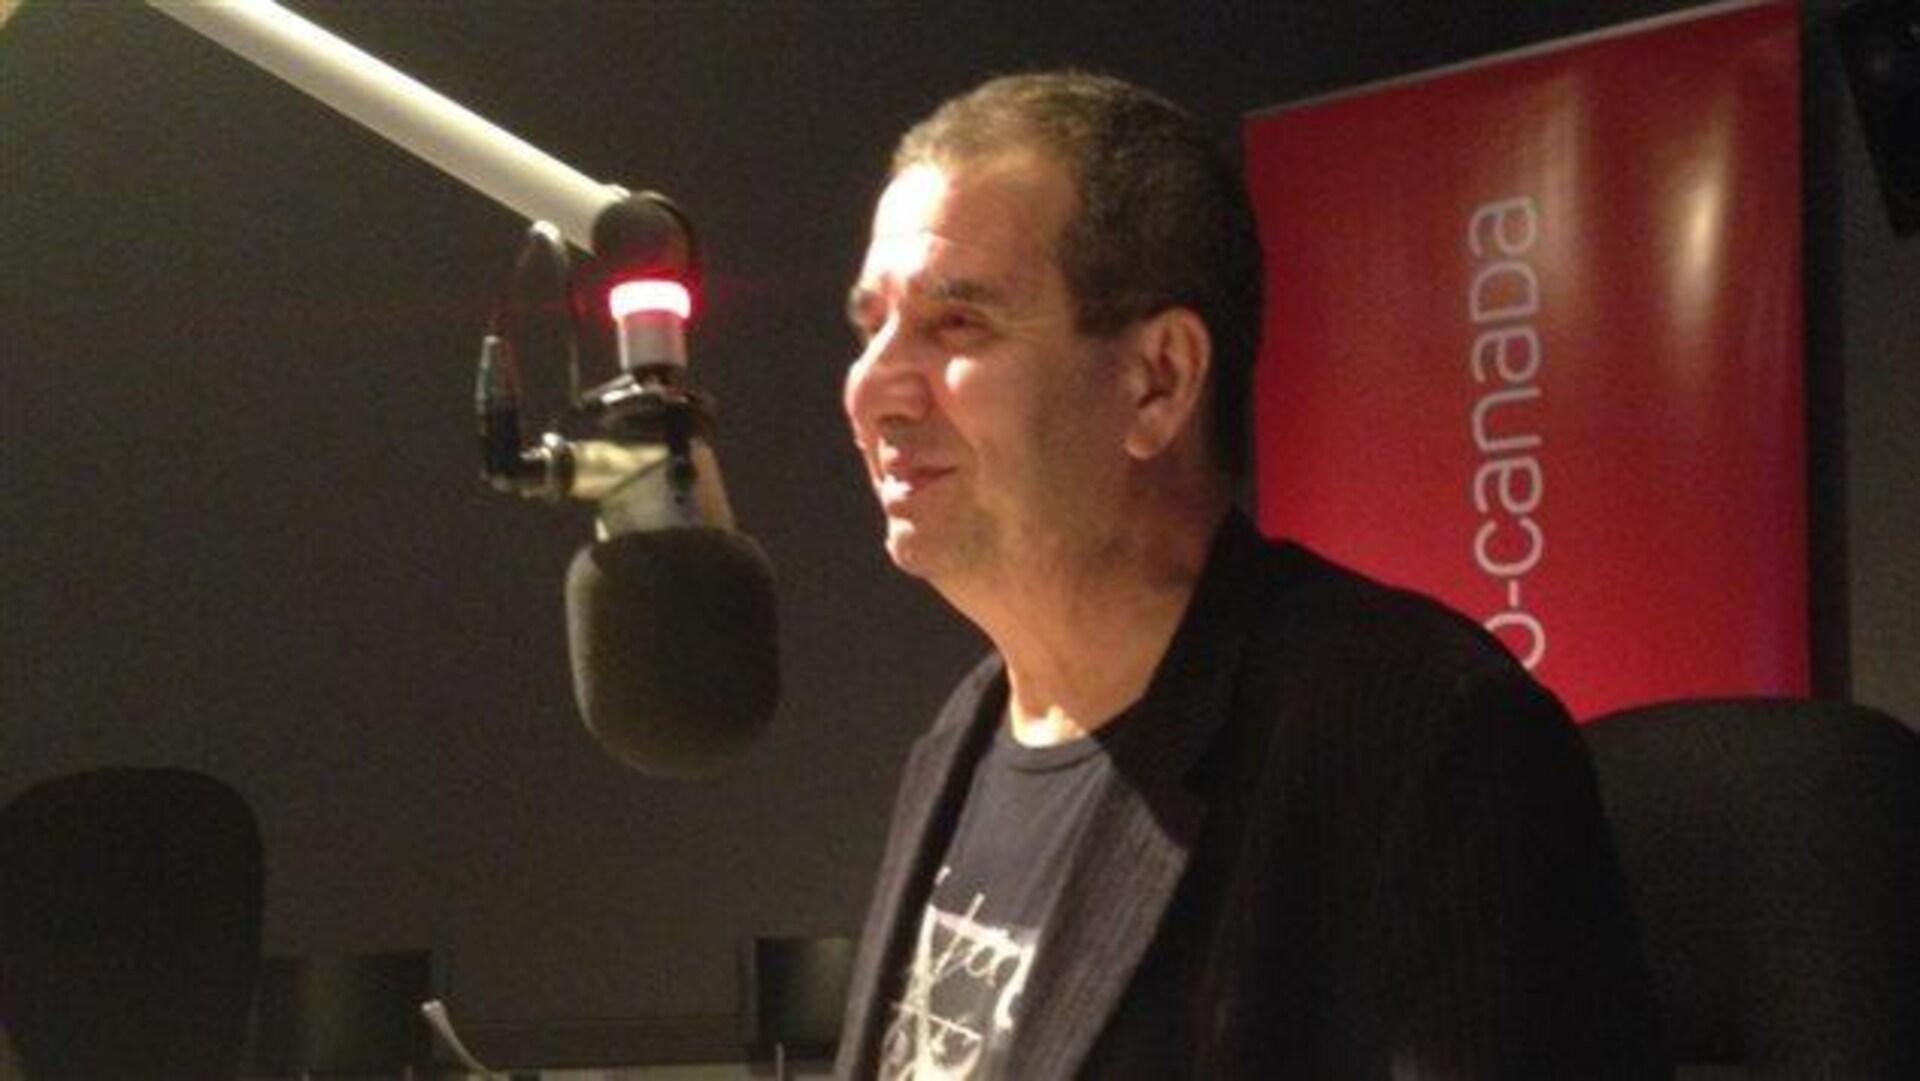 Valéry Vlad, président du Salon du livre de Toronto au micro de Radio-Canada en studio en 2015